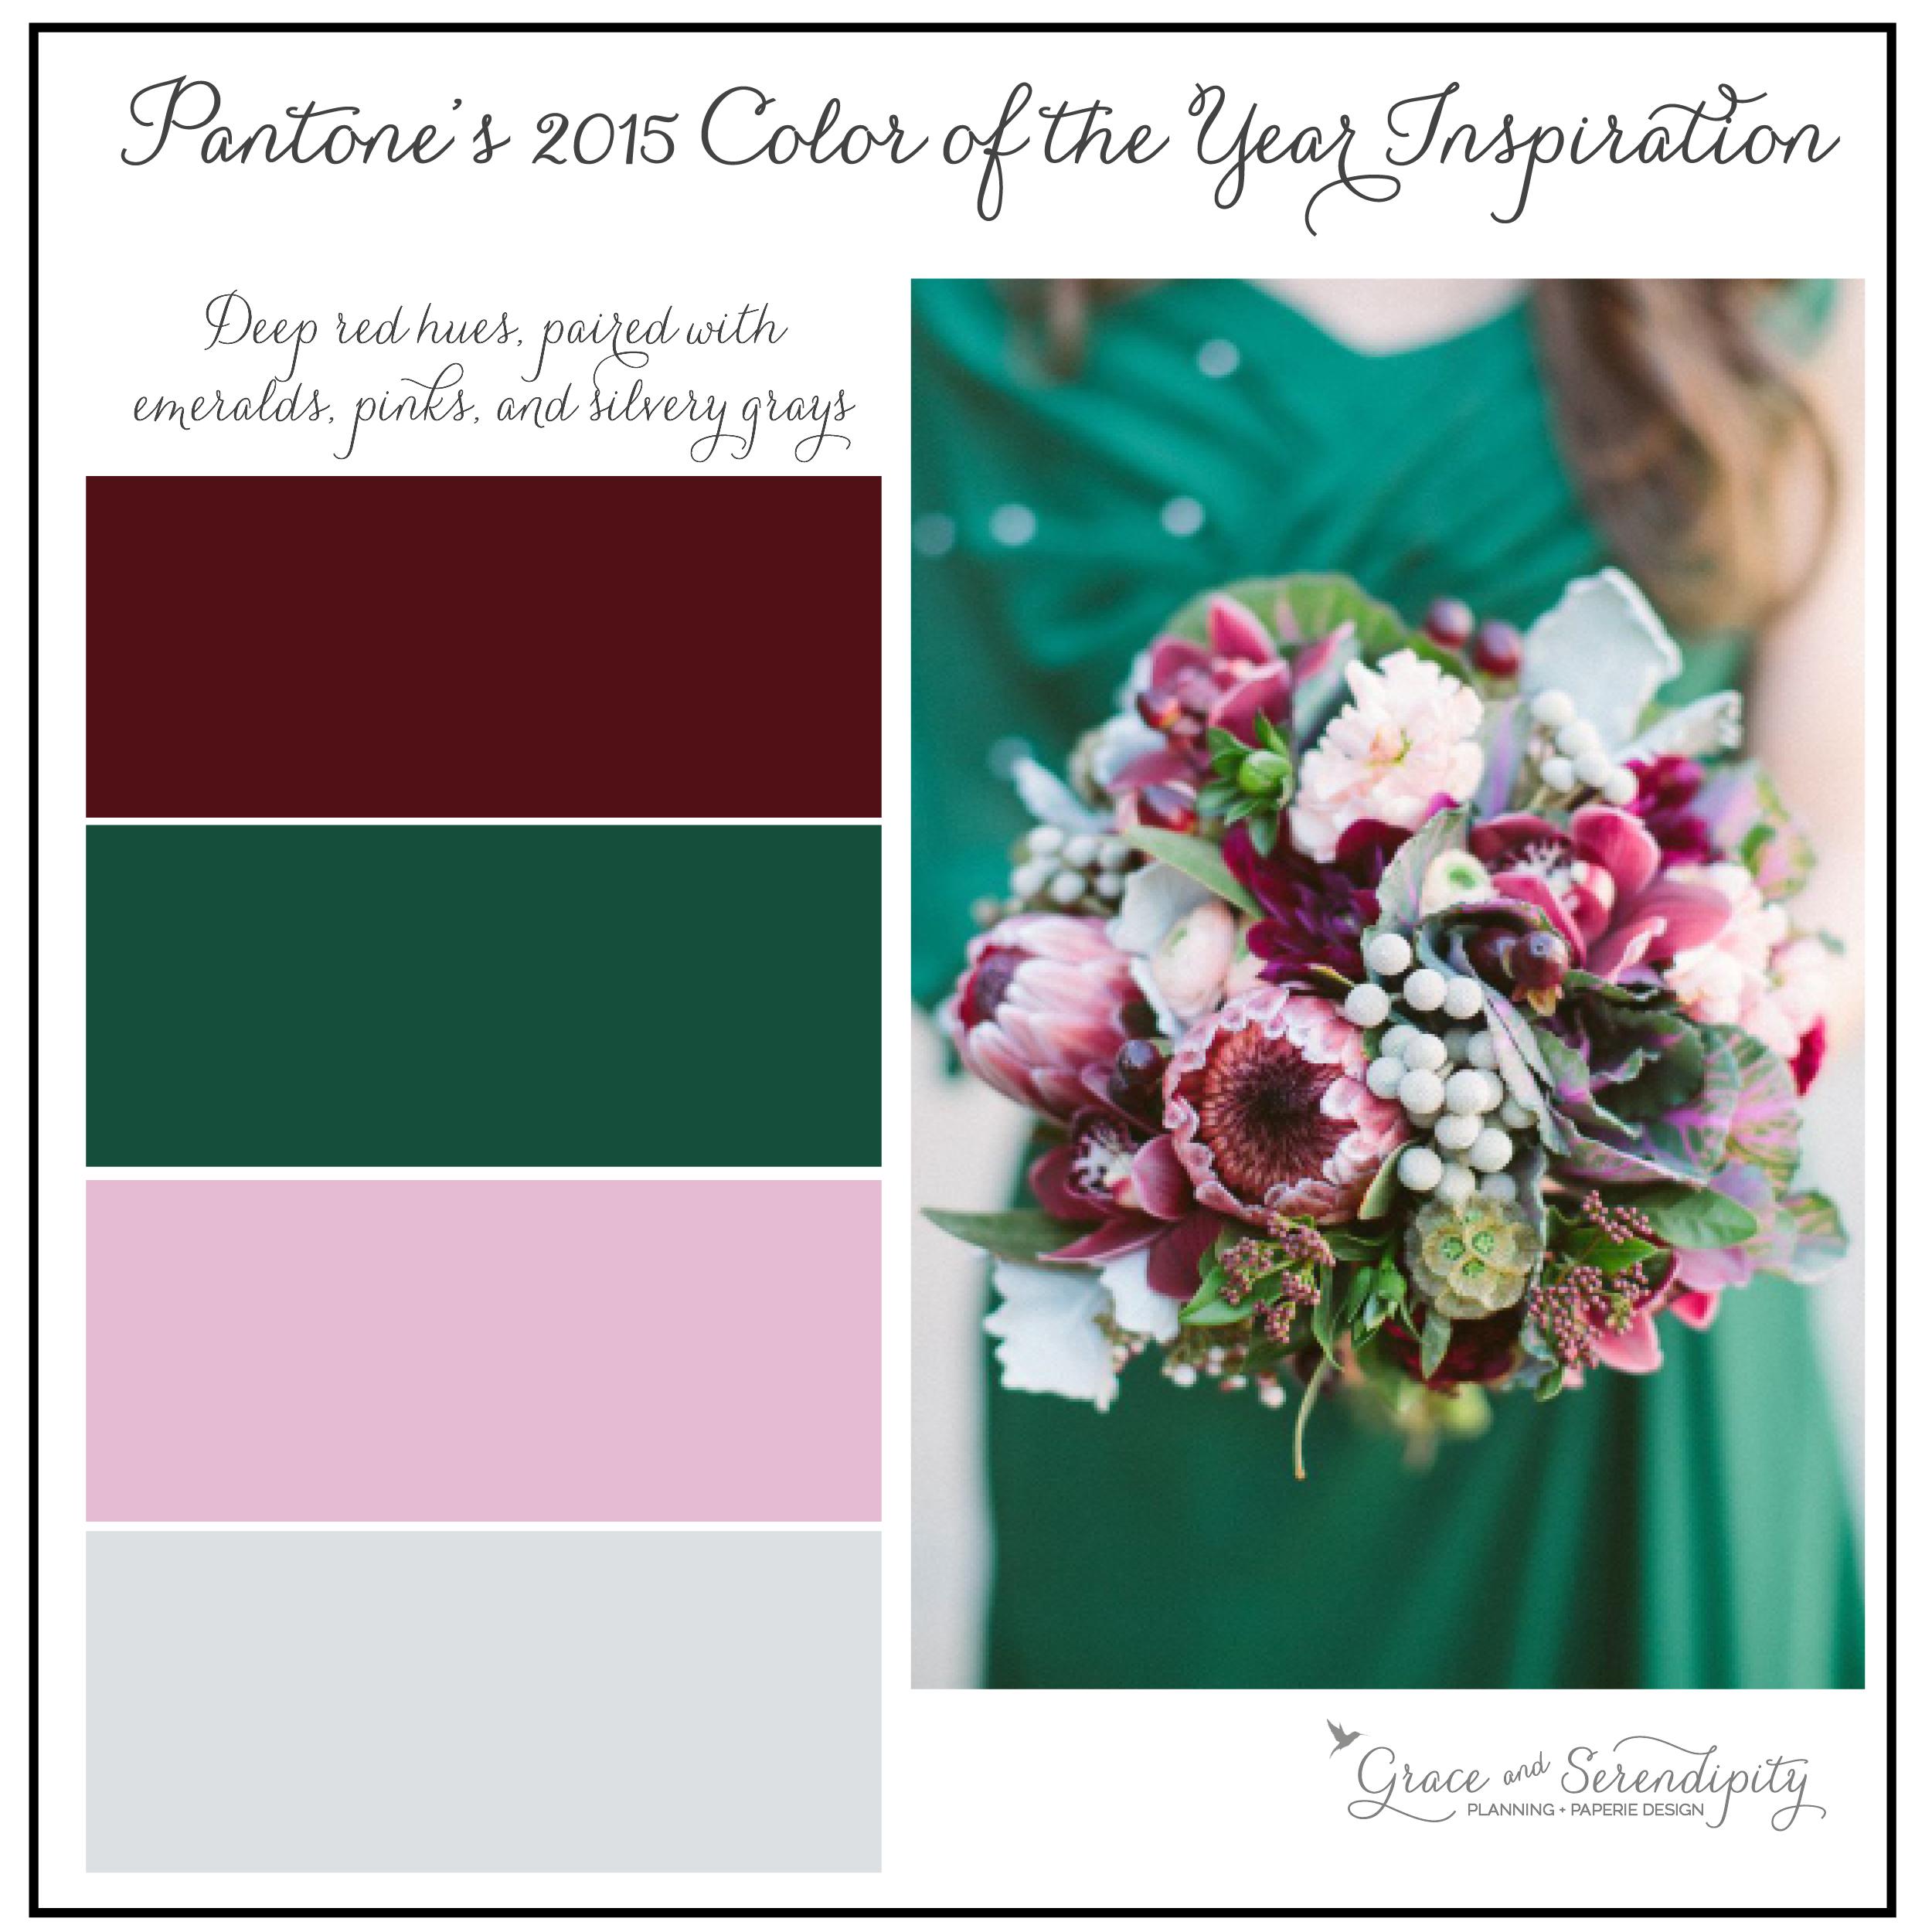 grace and serendipity - marsala inspiration board - burgundy, green, pink, silver